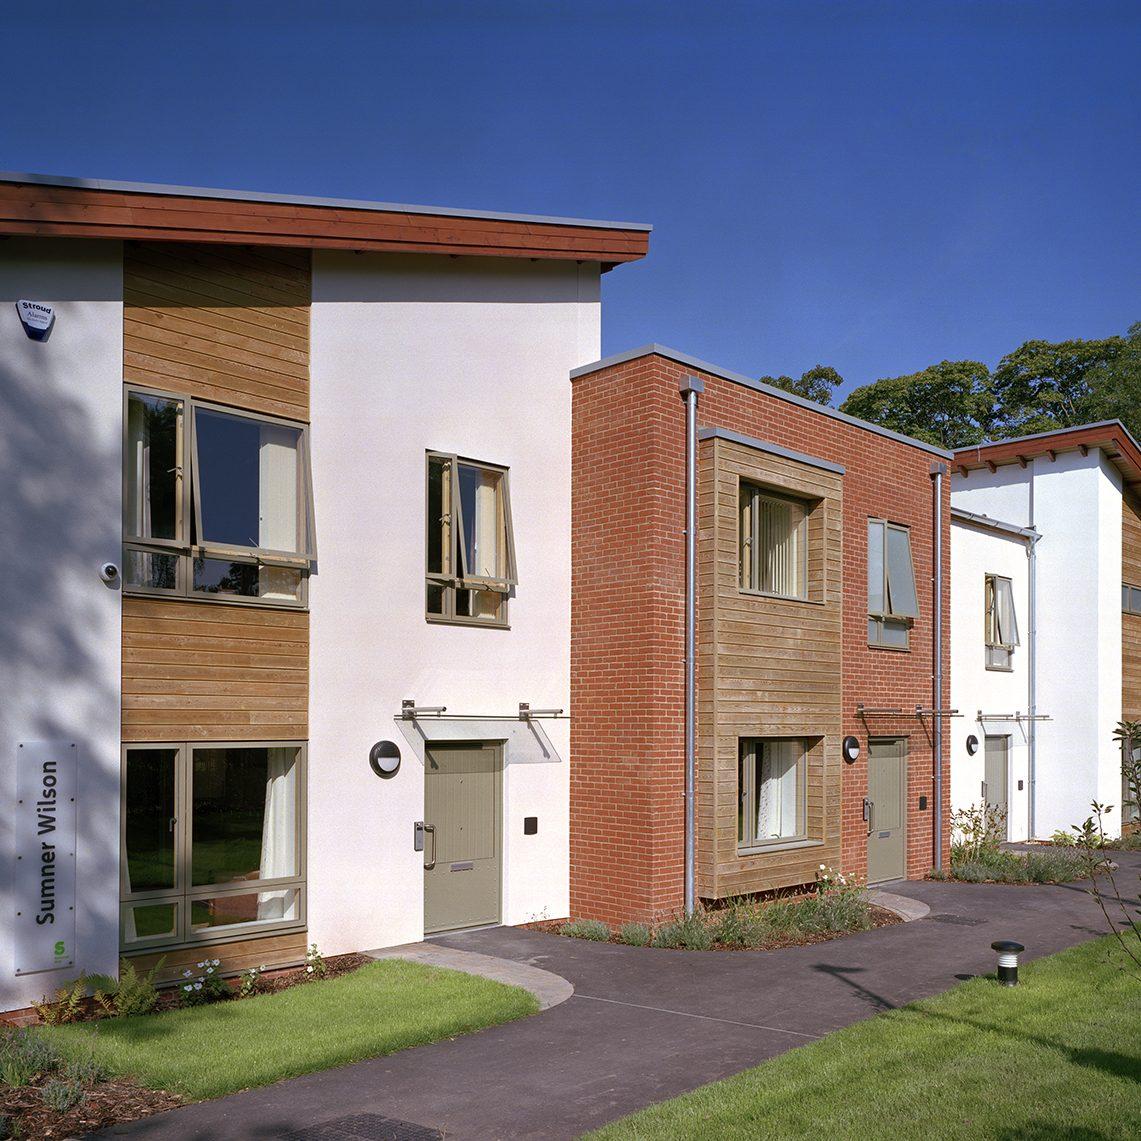 National Star College - specialist accommodation, Cheltenham